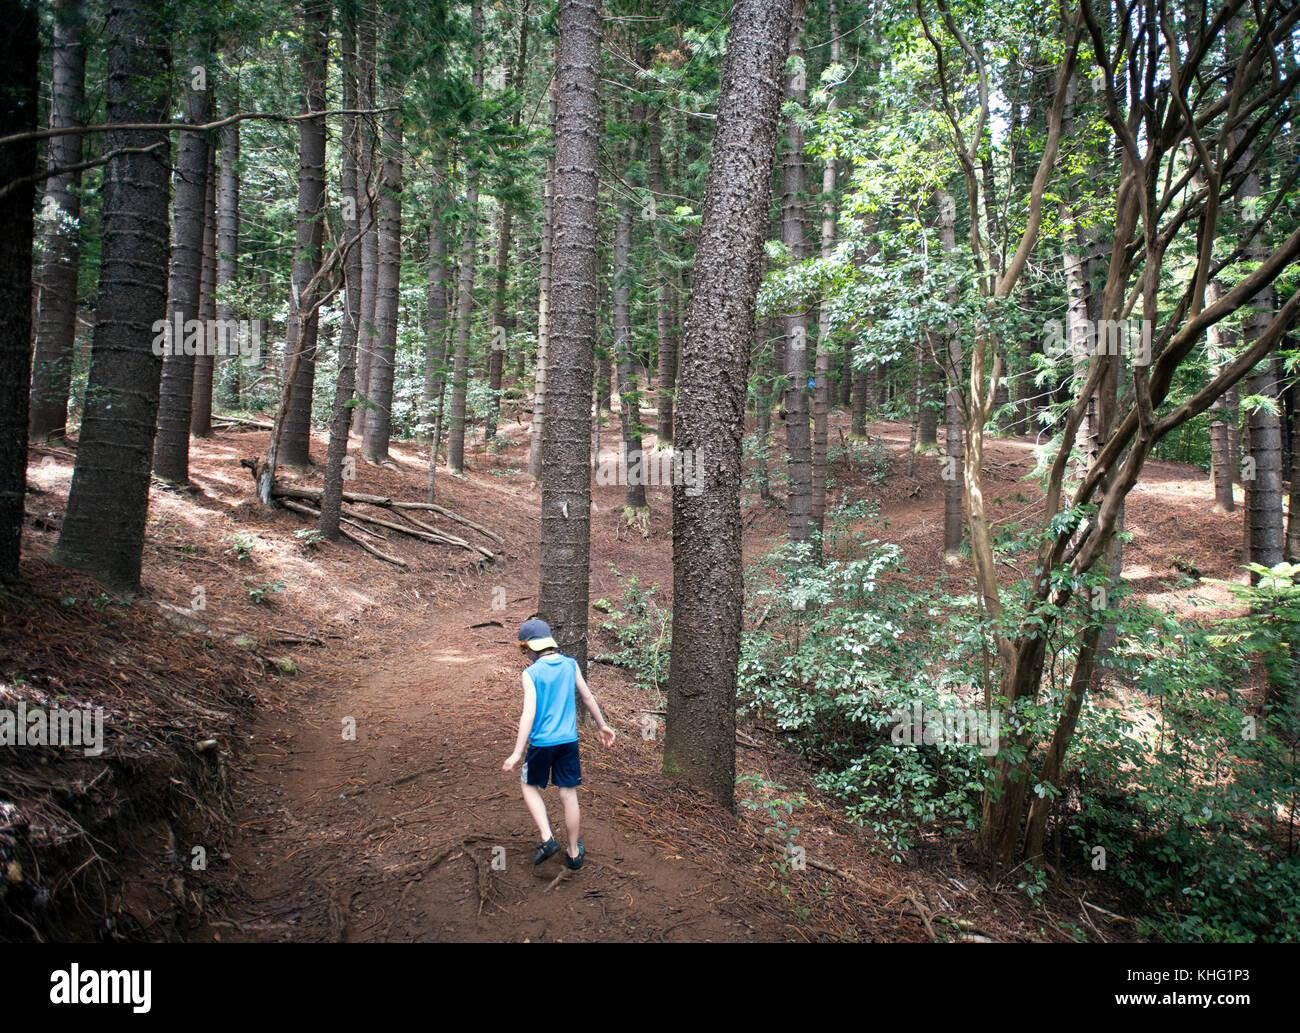 Boy walking through Cook Pines in Nounou Forest - Stock Image